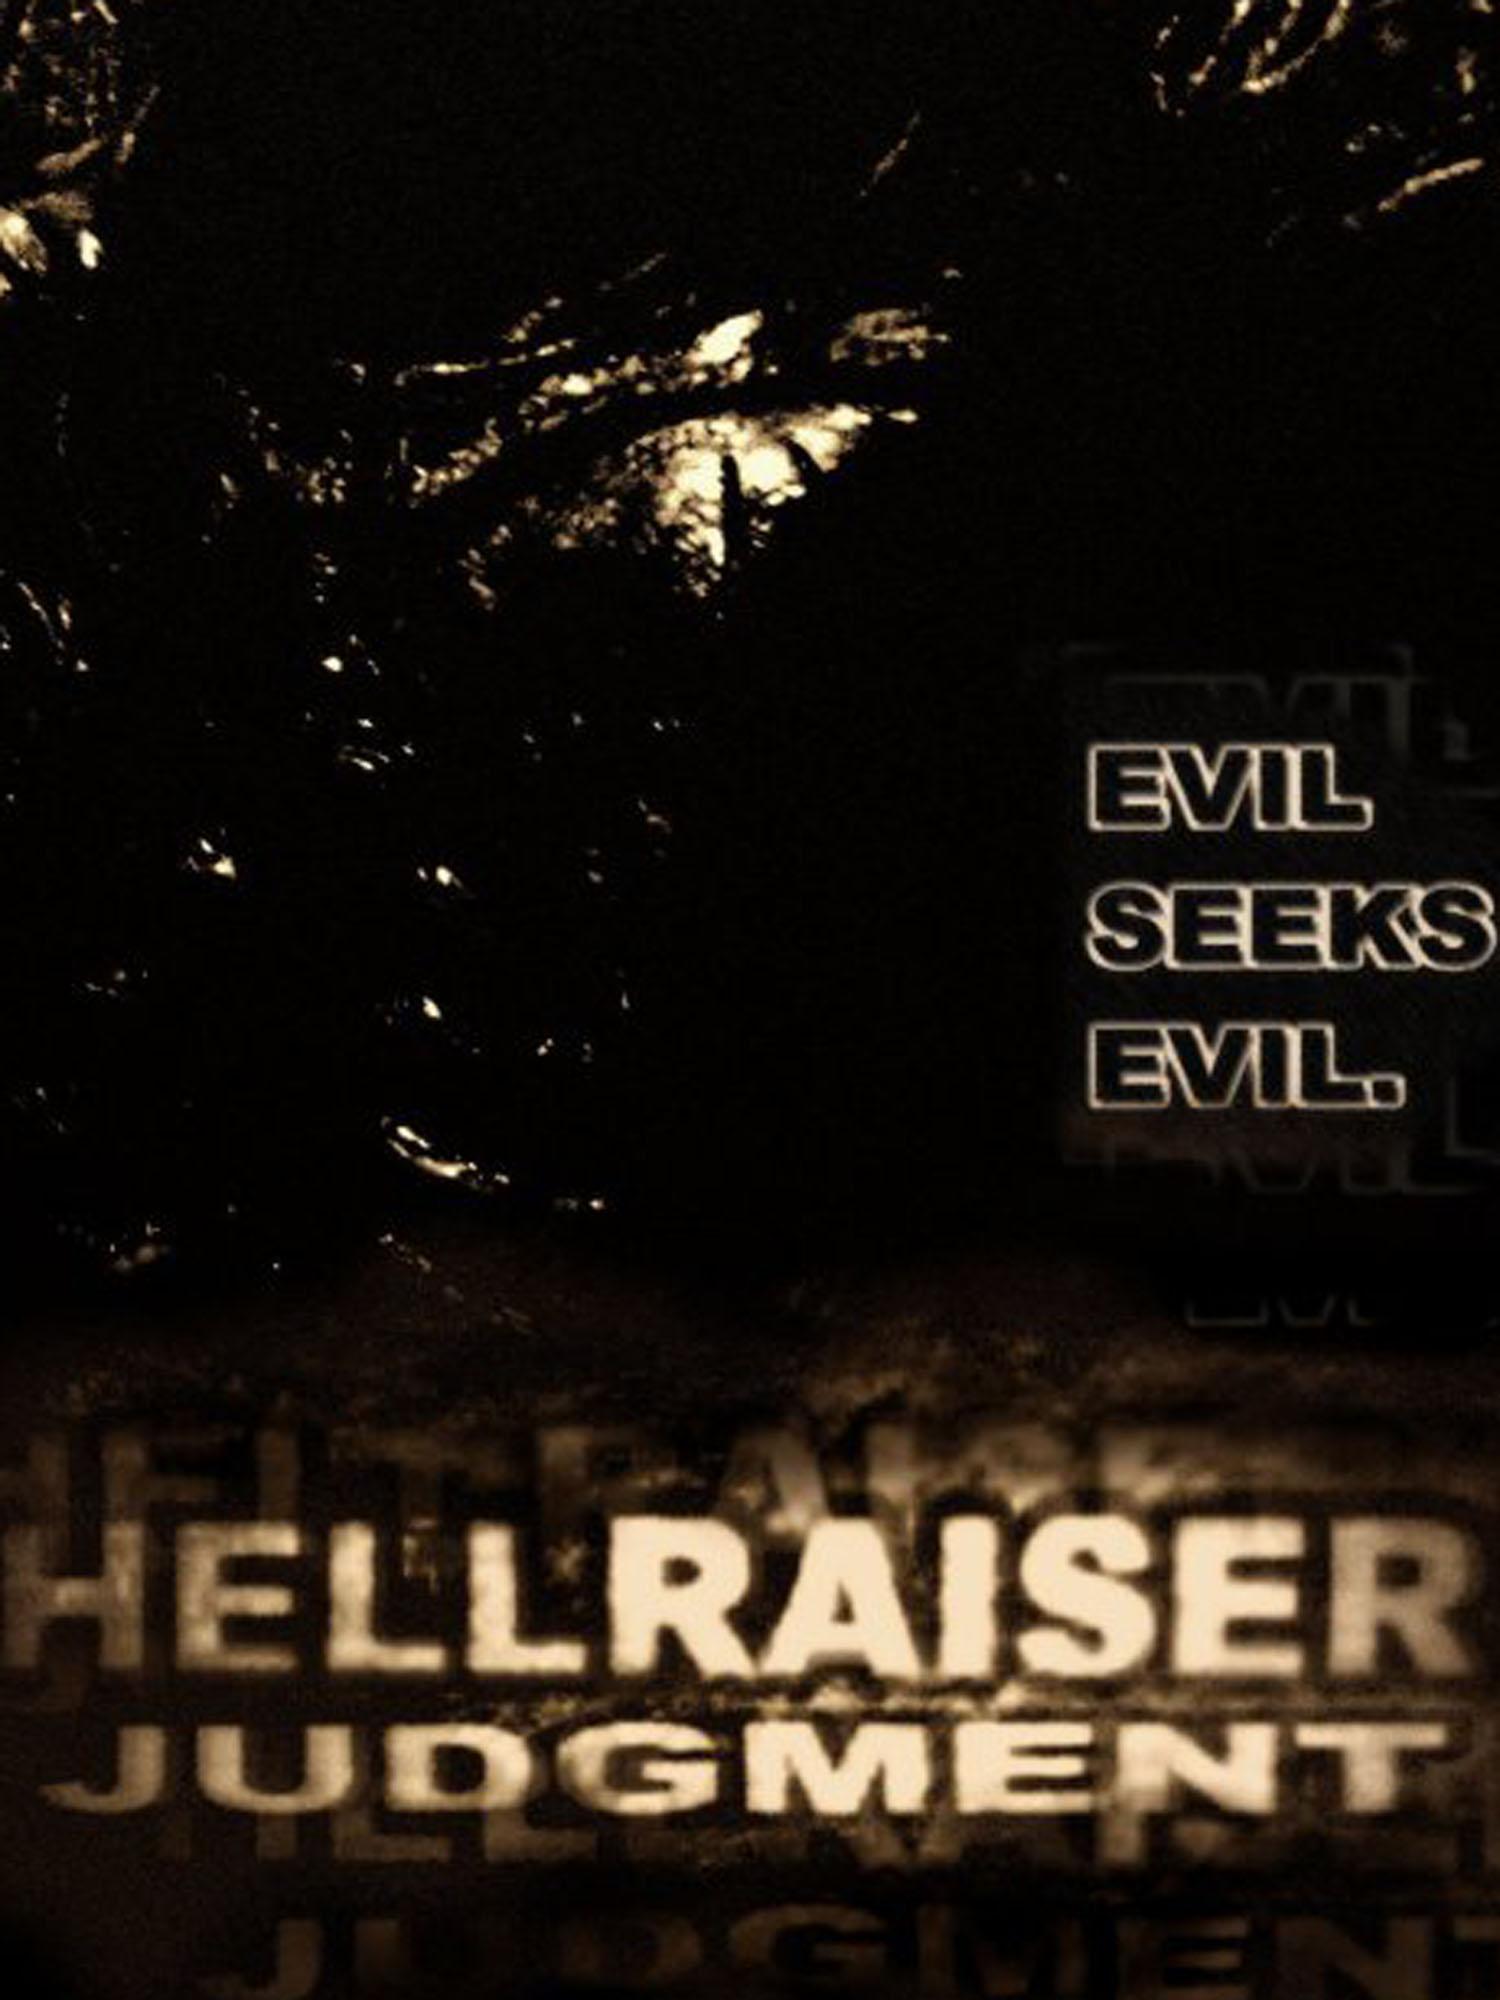 hellraiser-judgment.jpg